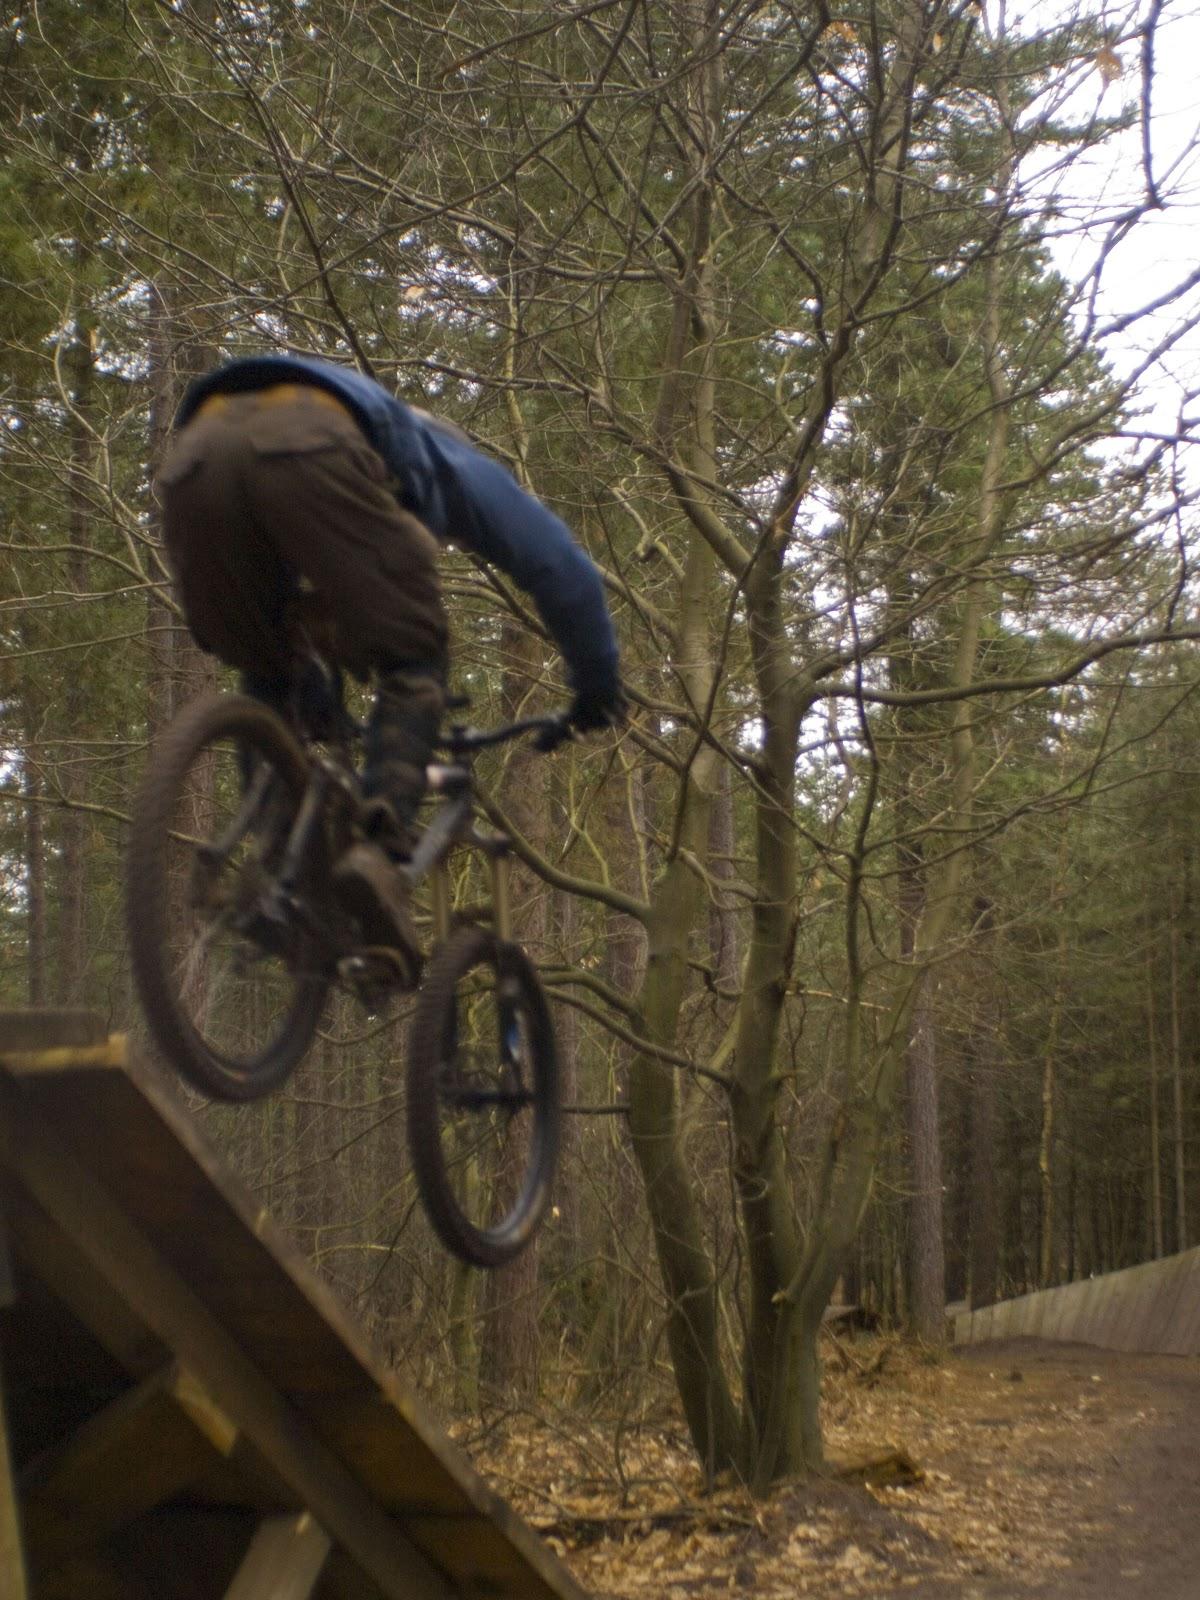 Sherwood Pines The Black Runs One Loose Crank S Mountain